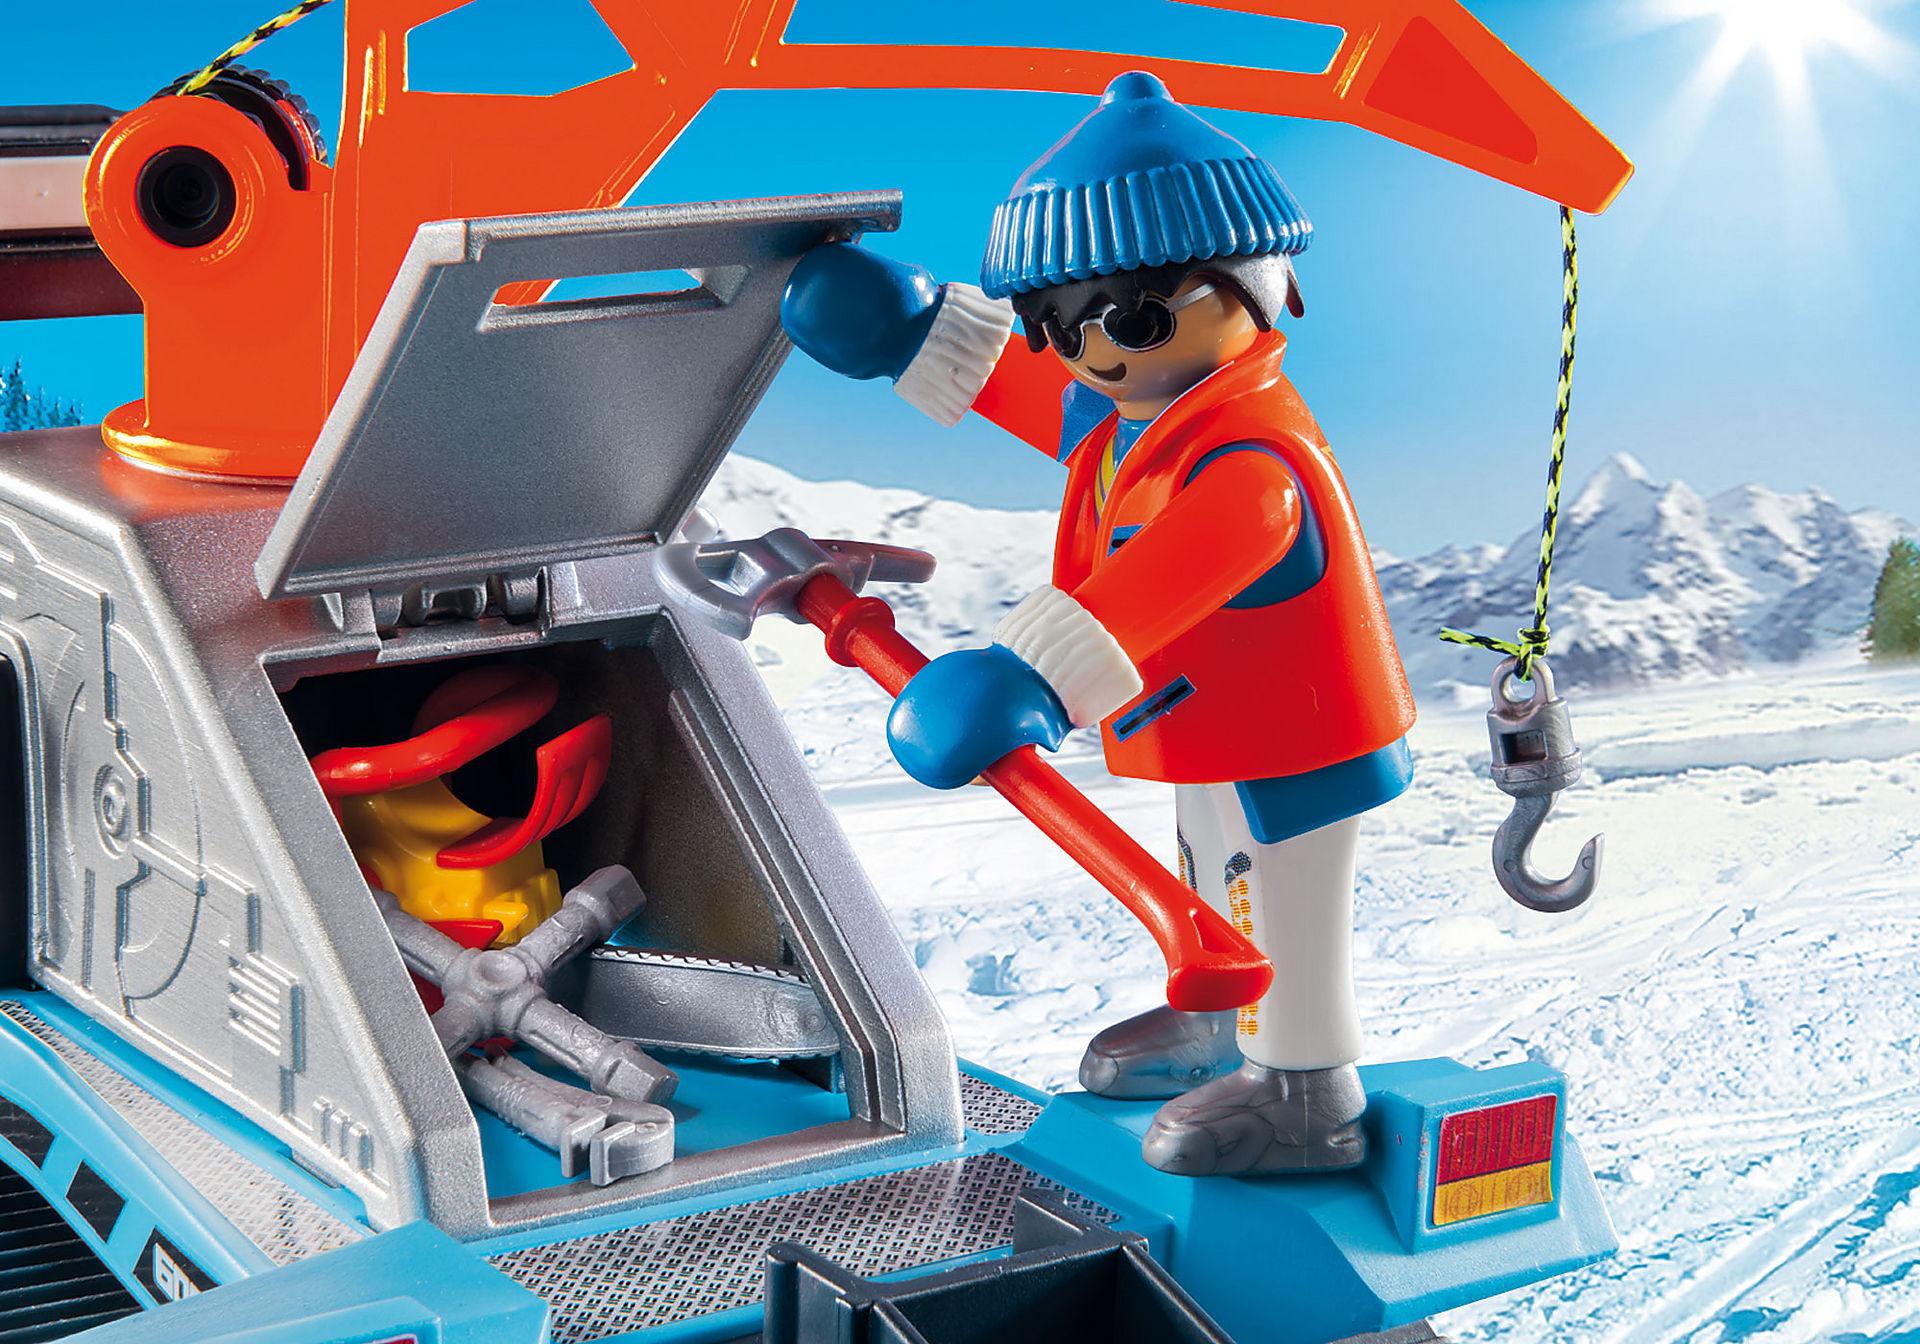 http://media.playmobil.com/i/playmobil/9500_product_extra1/Όχημα χιονιού με ερπύστριες